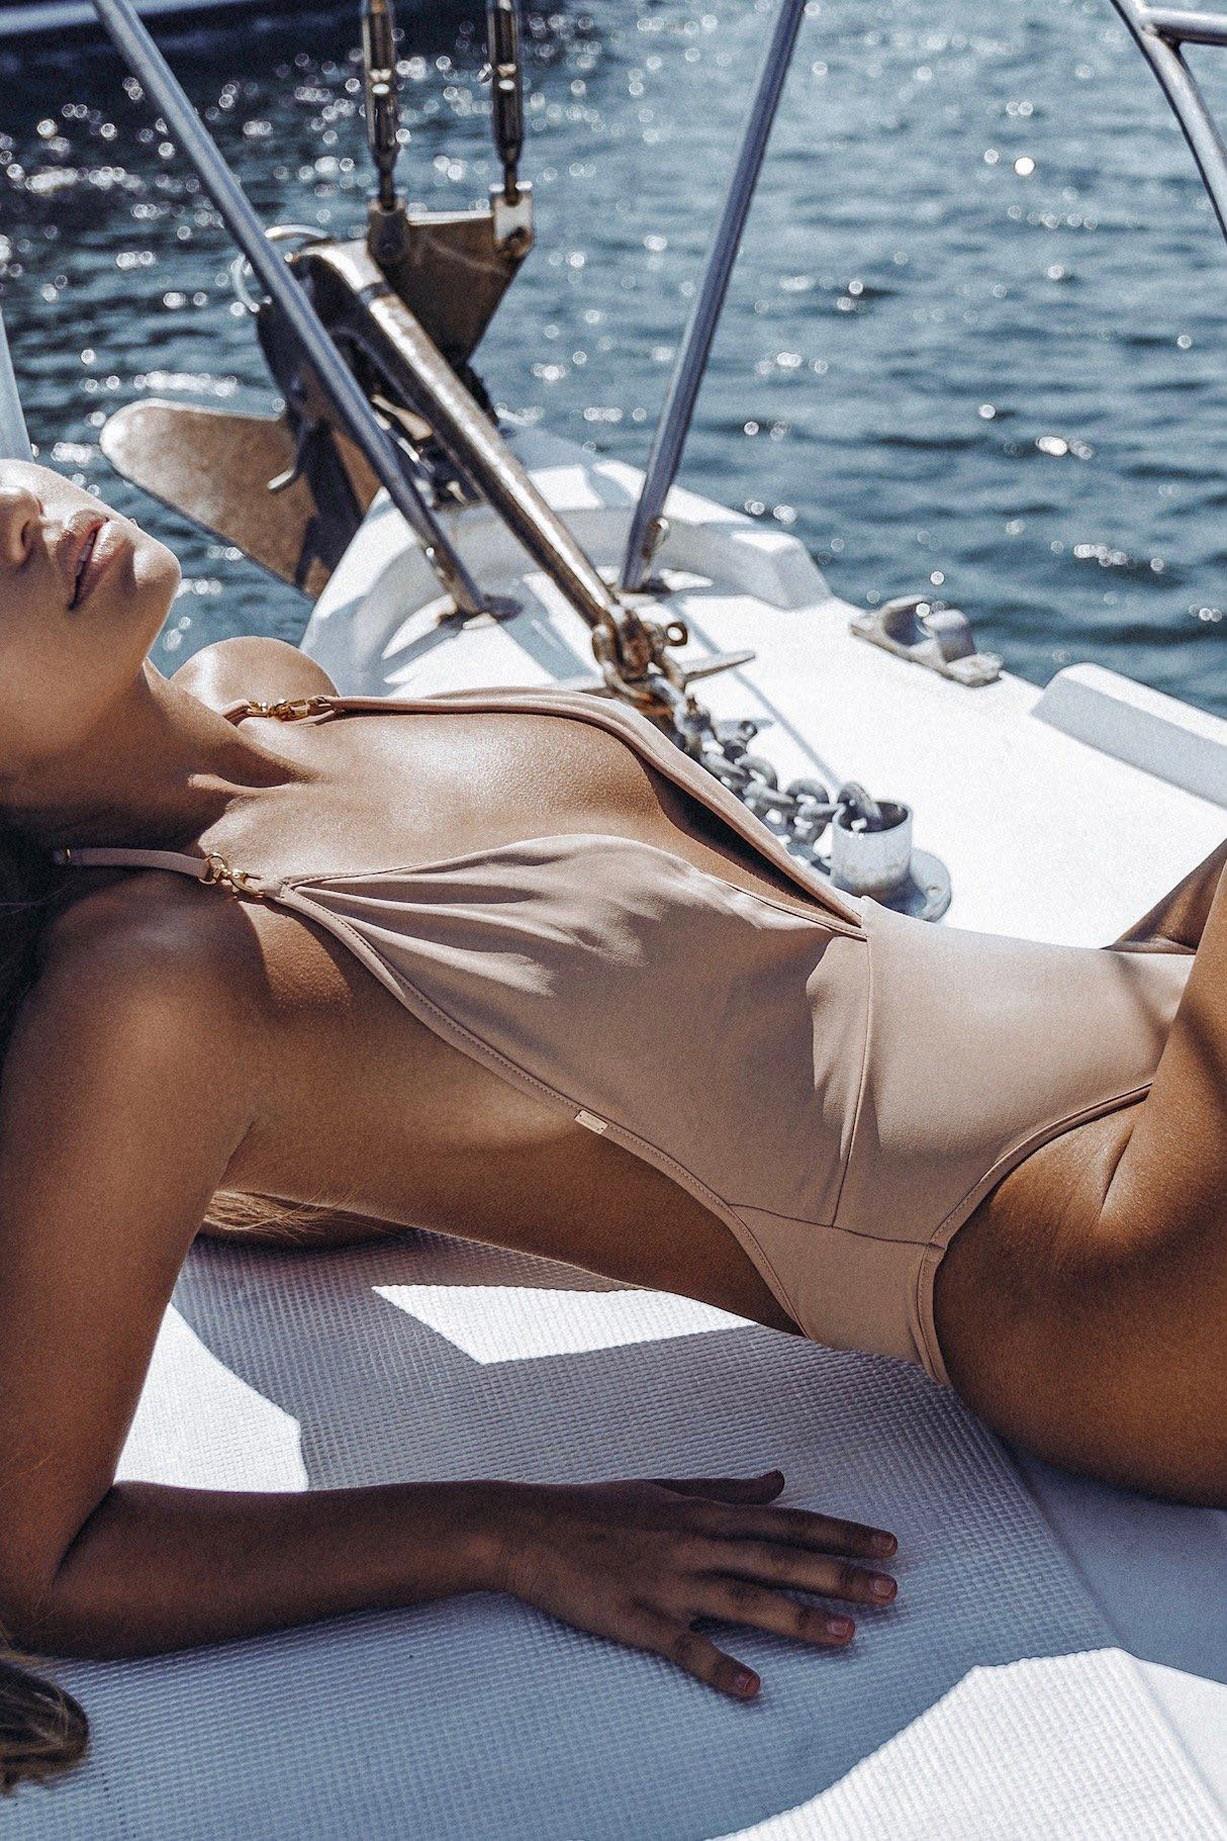 Sofia Jamora by Kesler Tran - Gooseberry Intimates and Seaside 2018